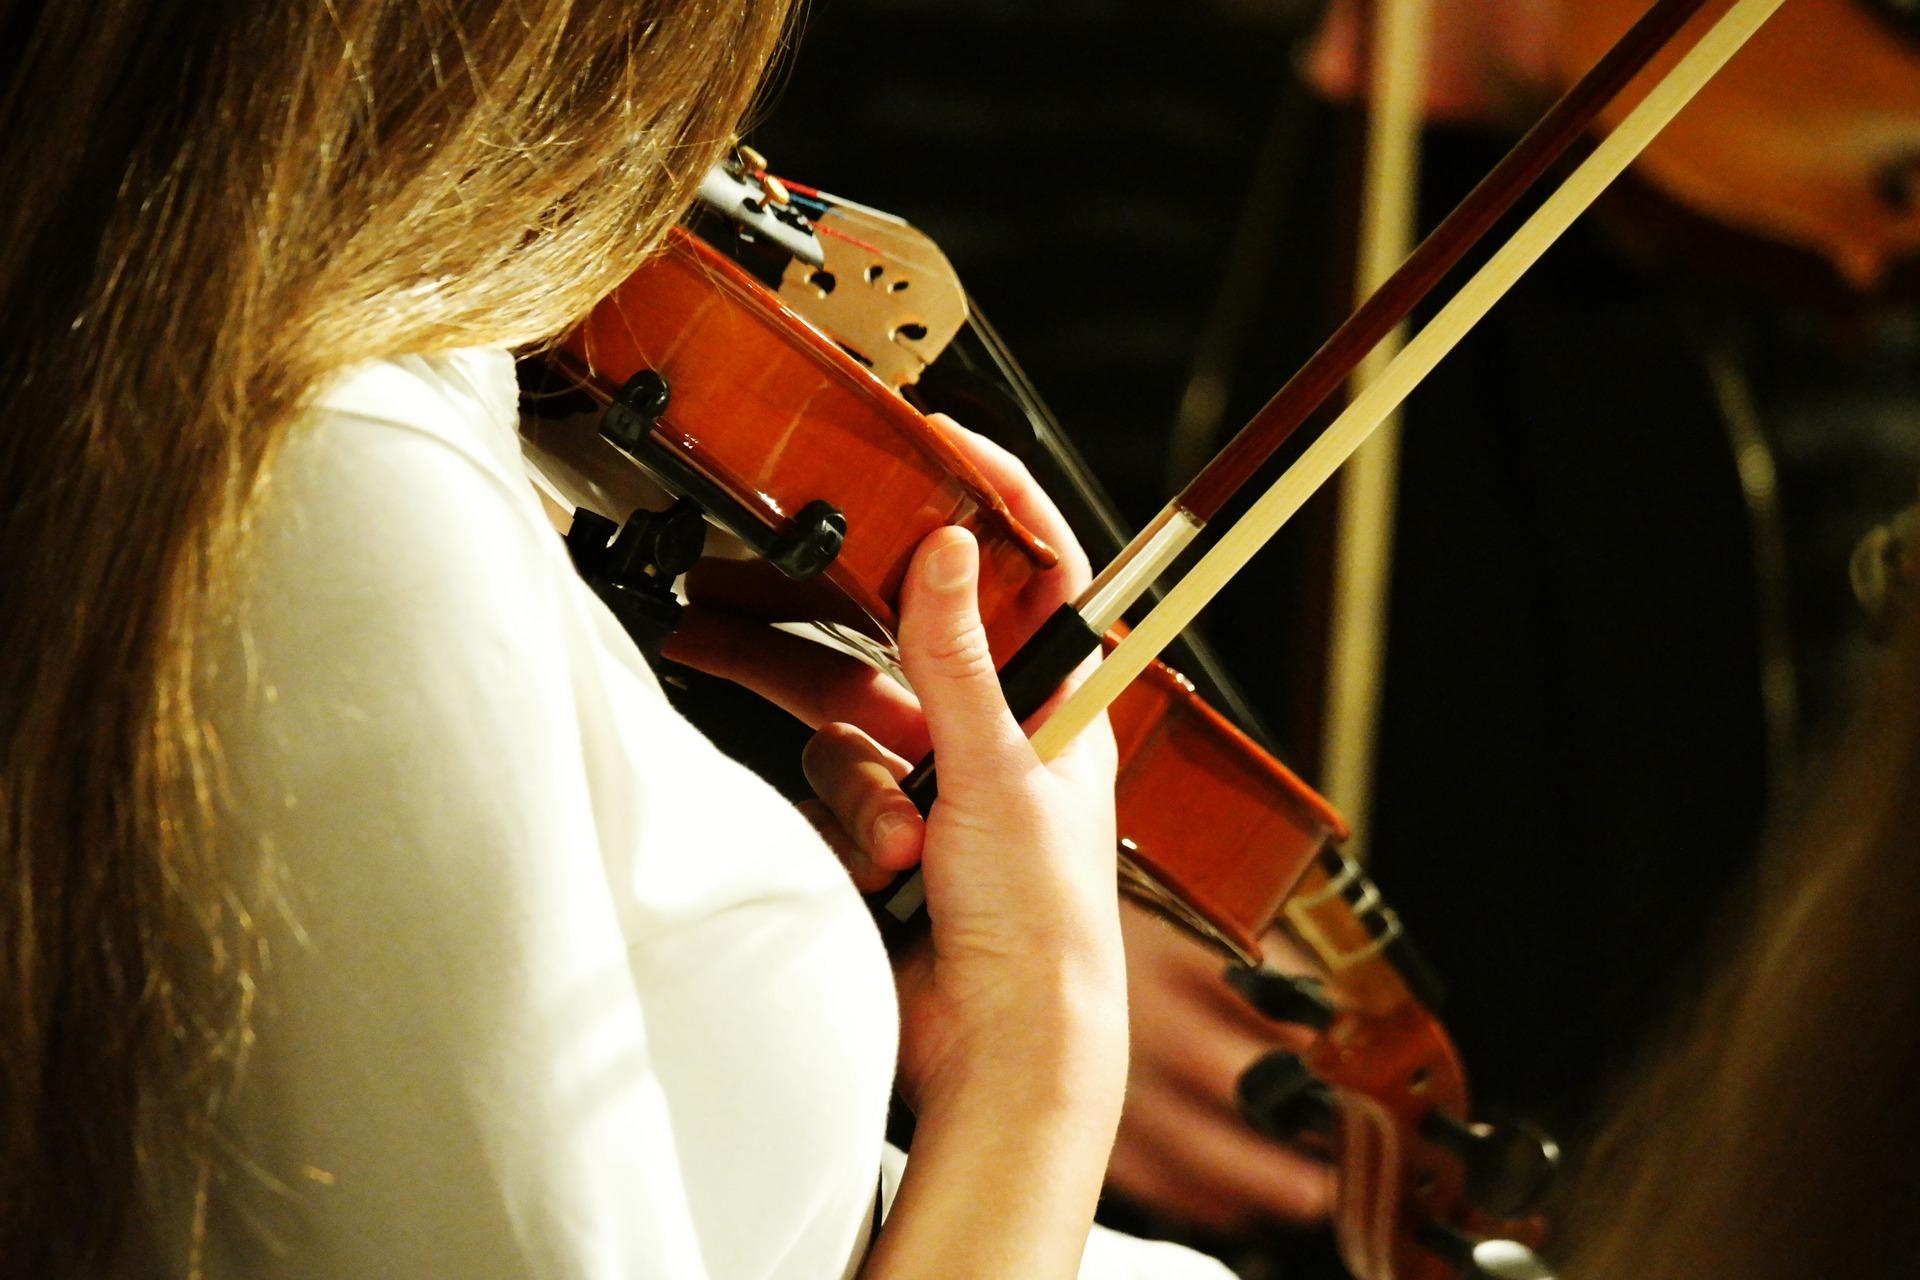 violin lessons tampa music school barrett school of music. Black Bedroom Furniture Sets. Home Design Ideas